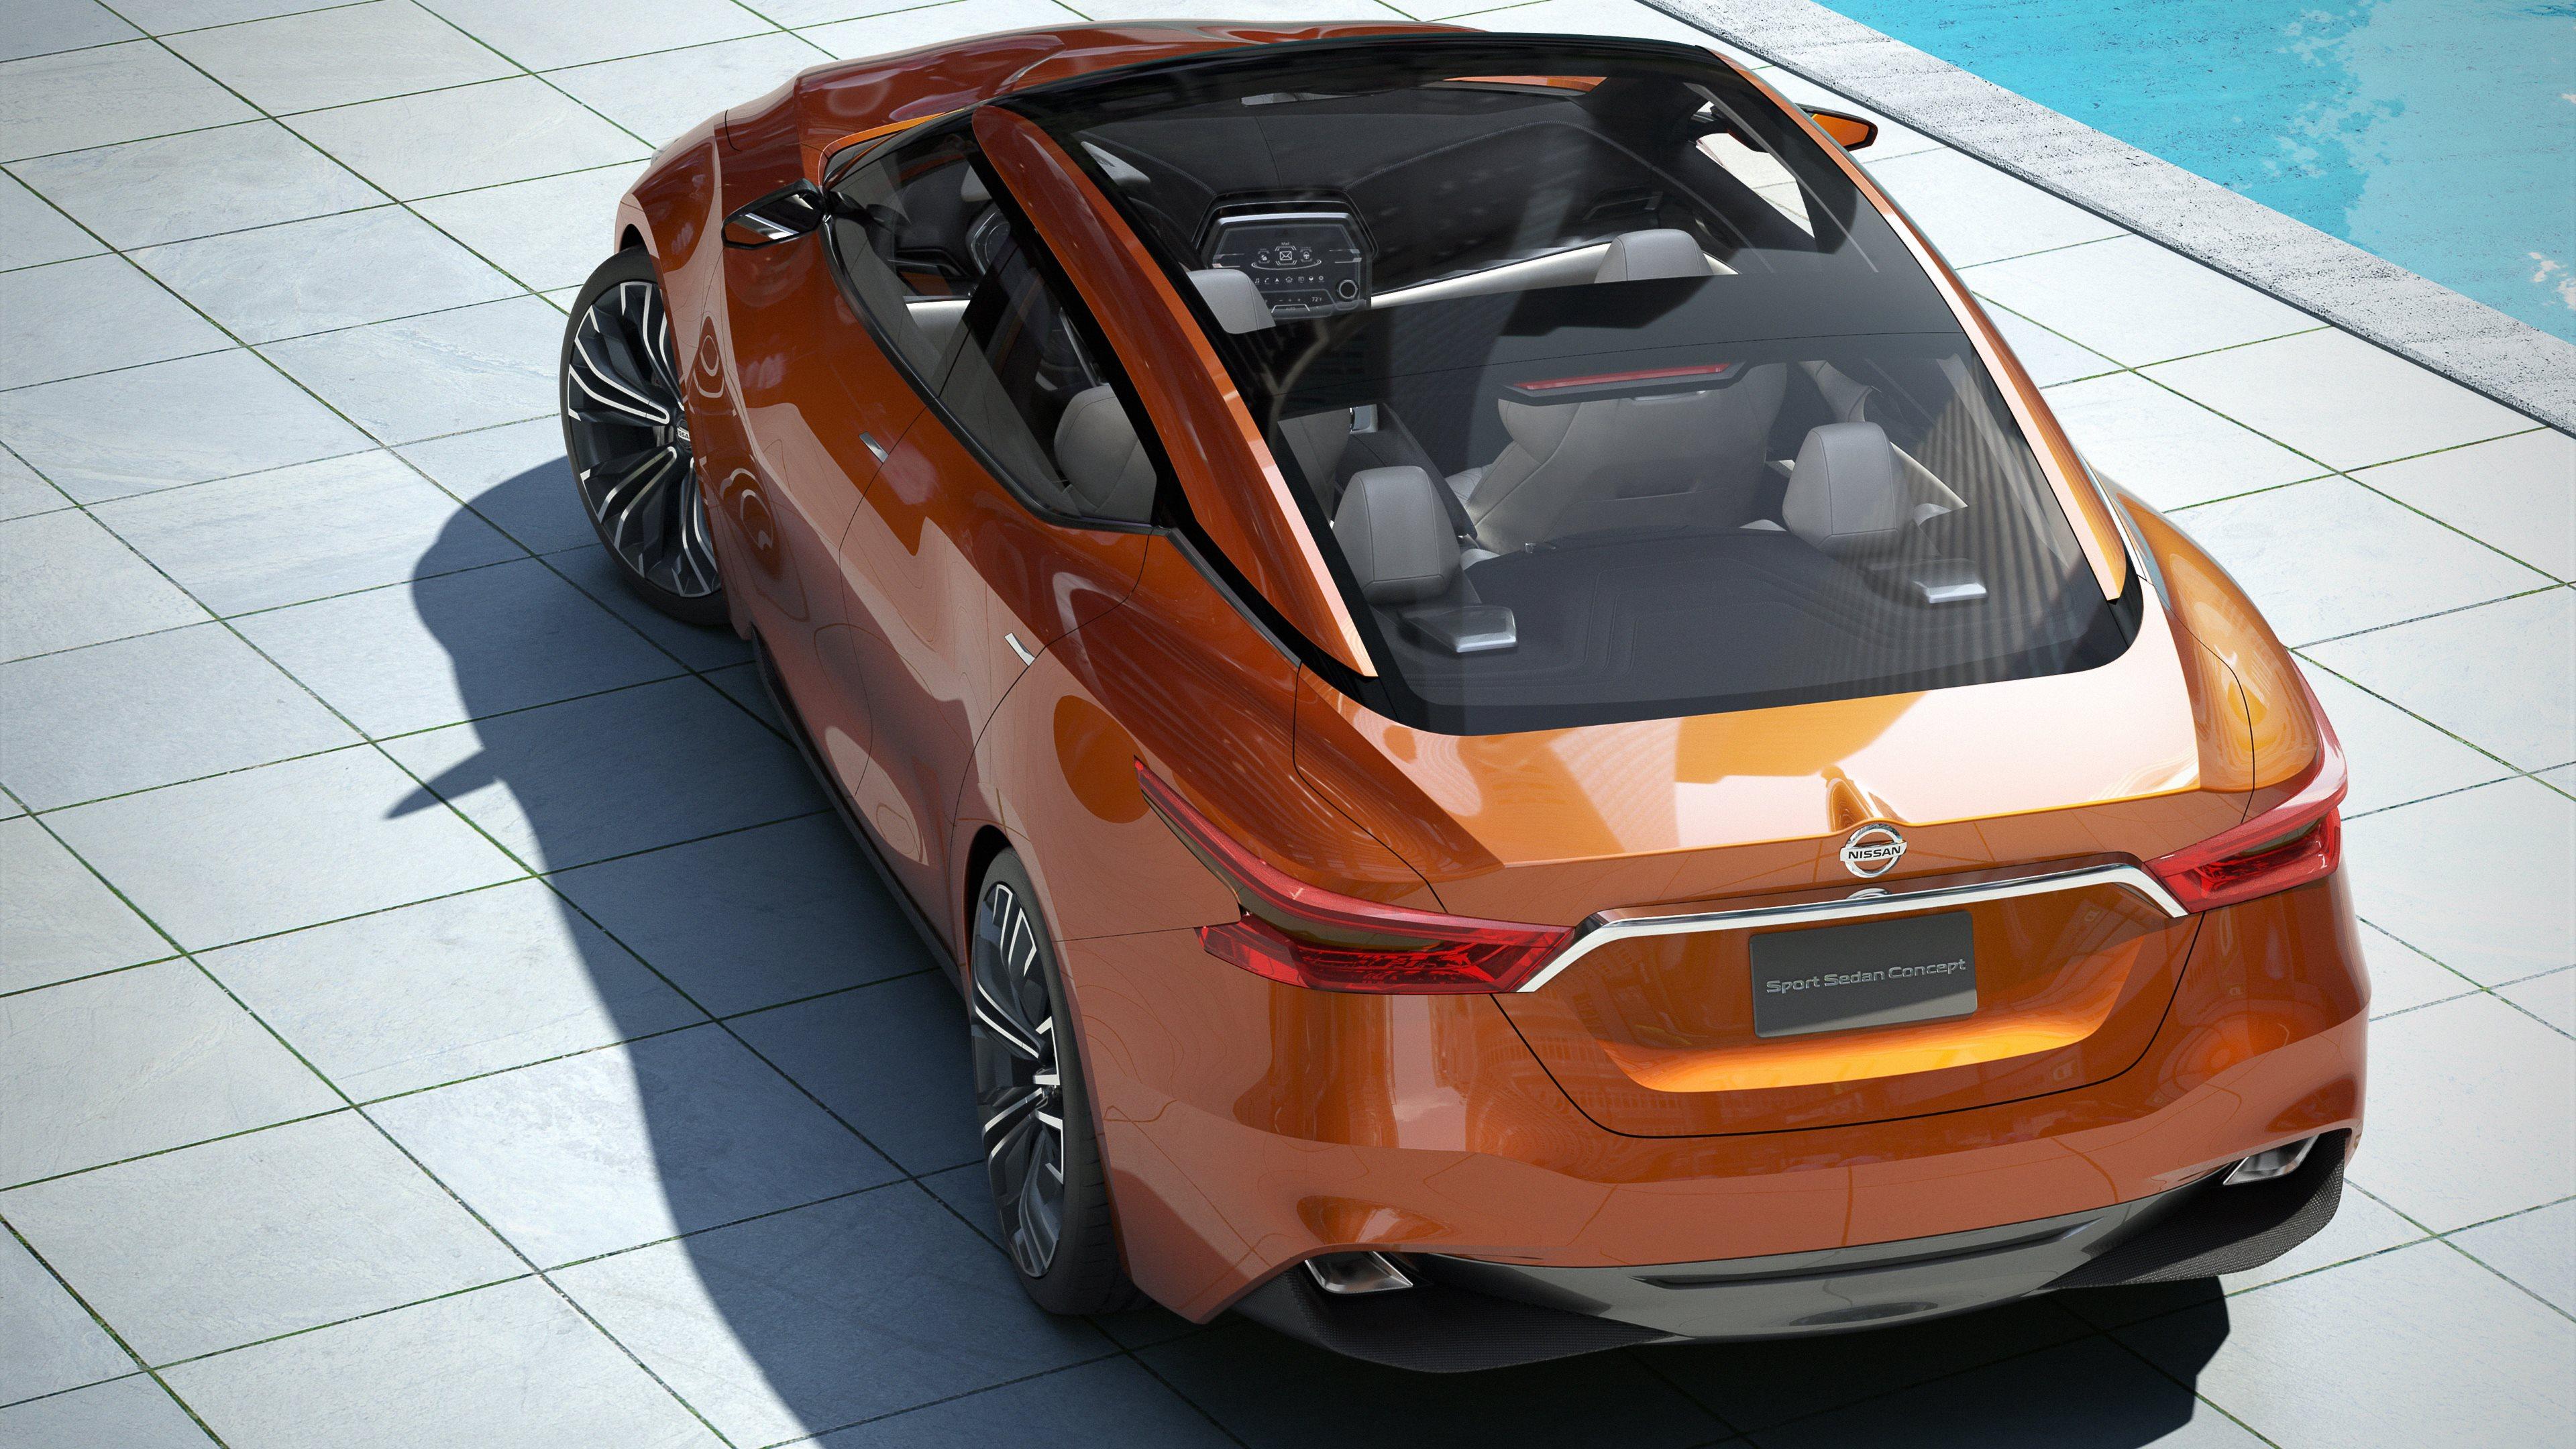 Spyker Sedan Stories by Top Bloggers on Notey